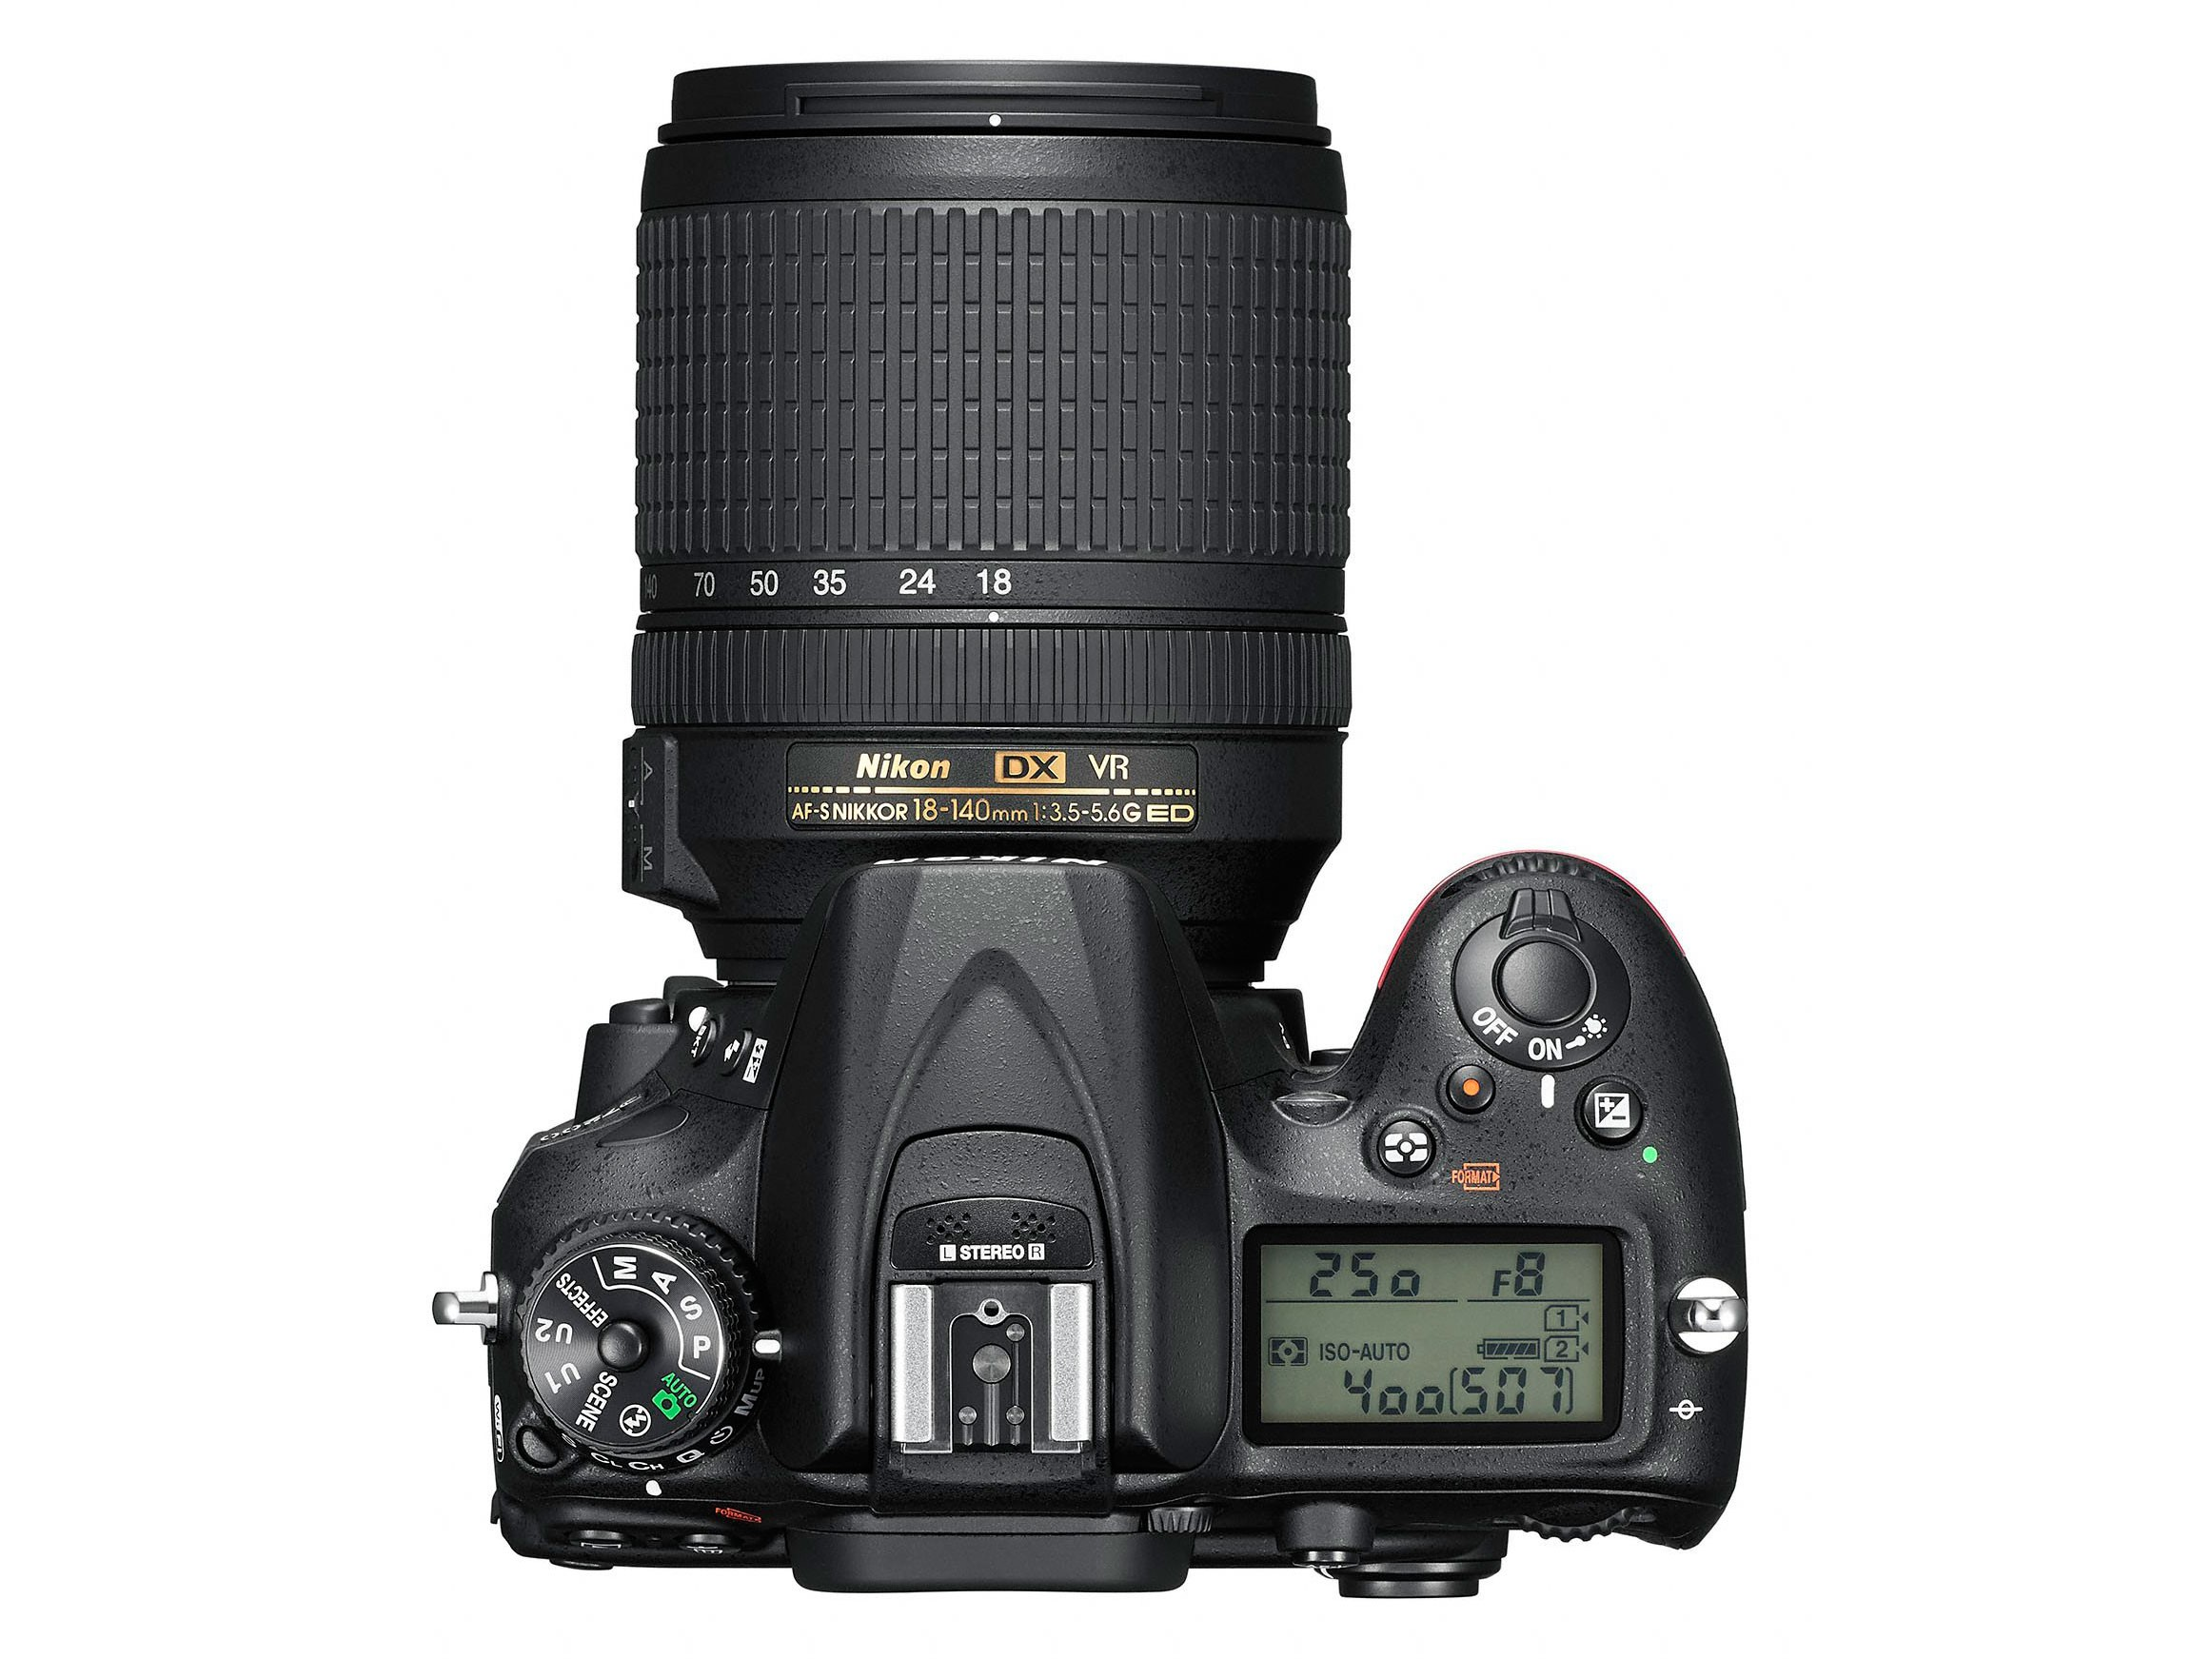 Nikon D7200 Announced Price 1 199 Camera News At